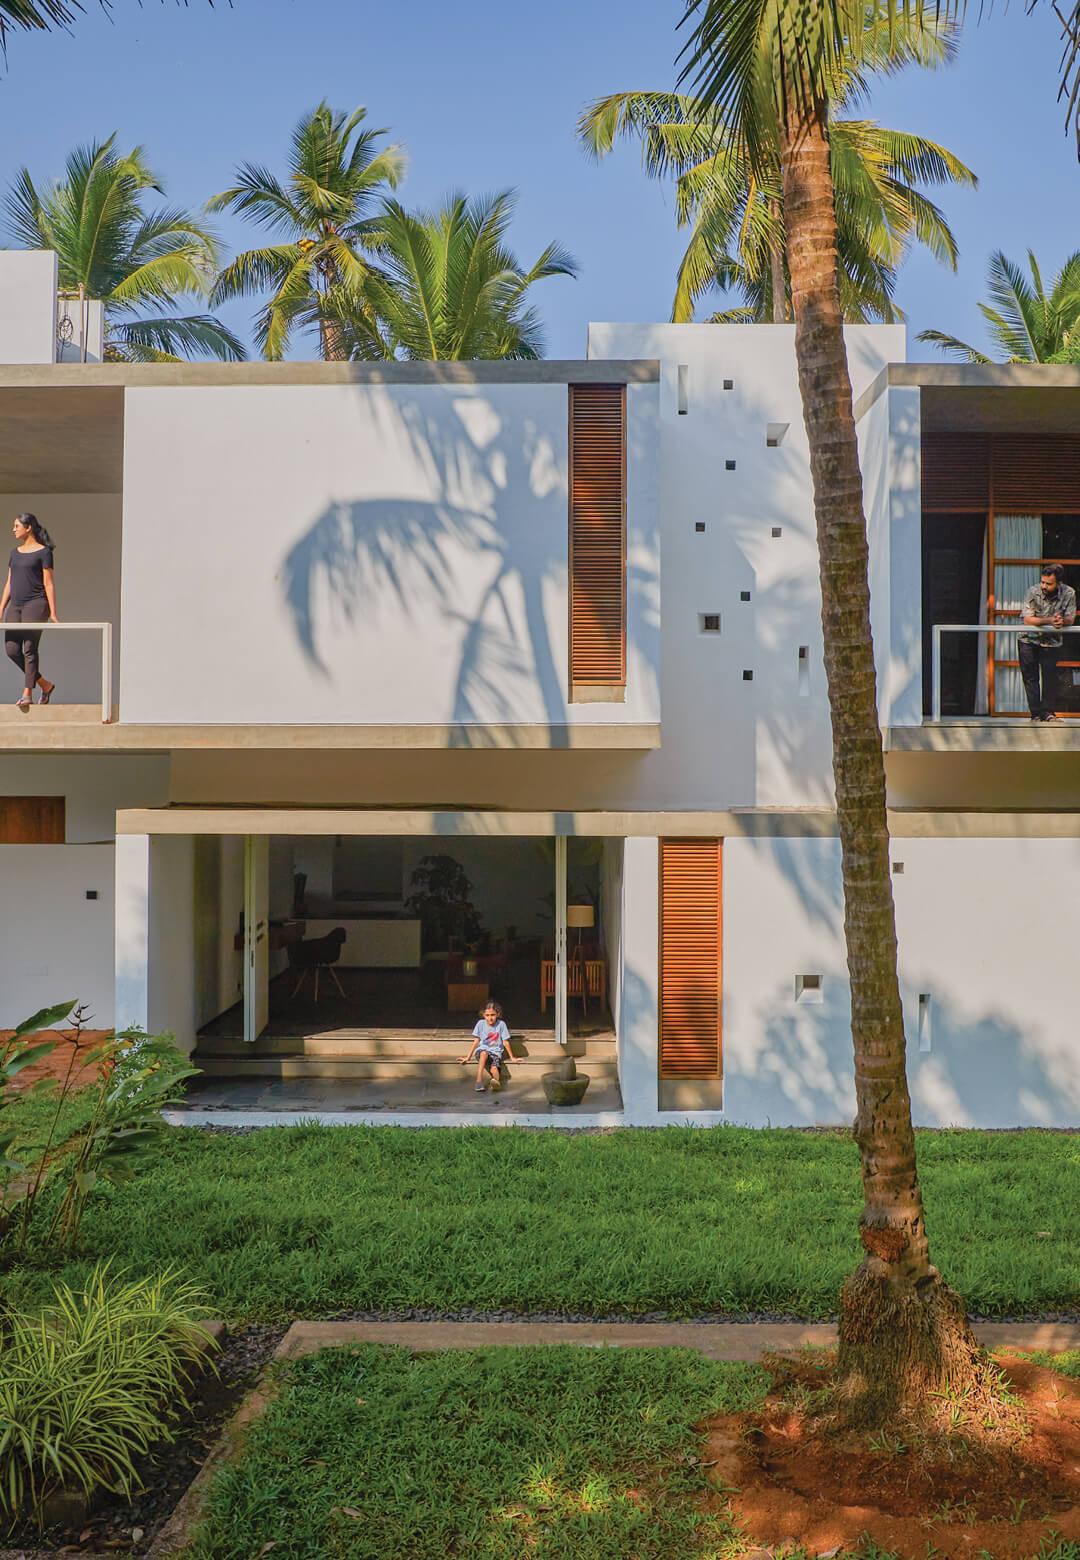 Aayi by Collage Architecture Studio |Collage Architecture Studio| Goa, India | STIRworld